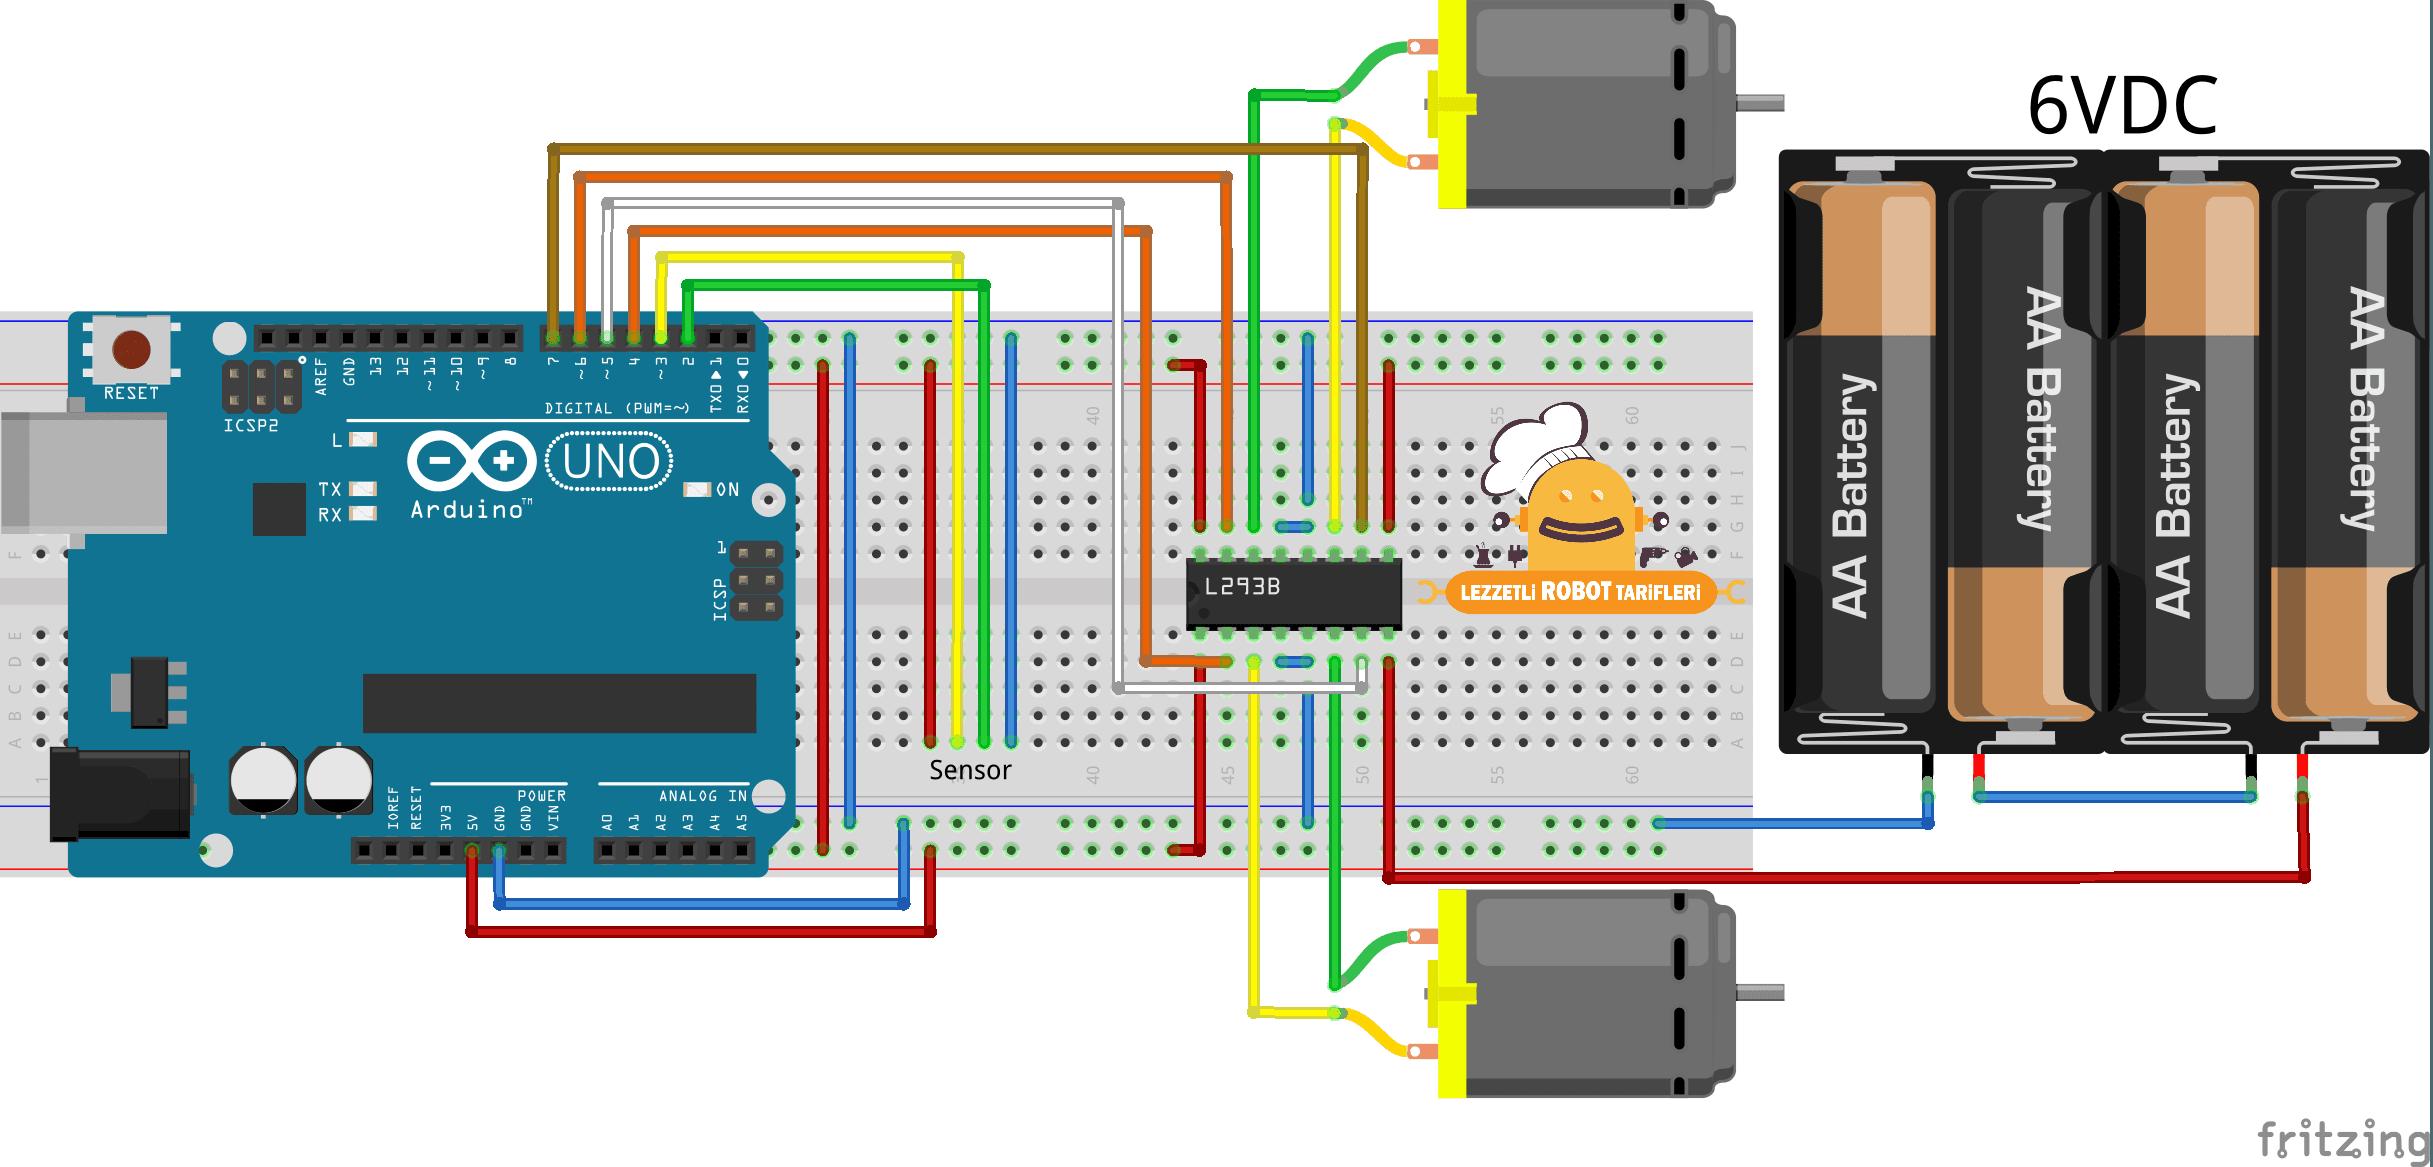 arduino ile cizgi izleyen robot surucu